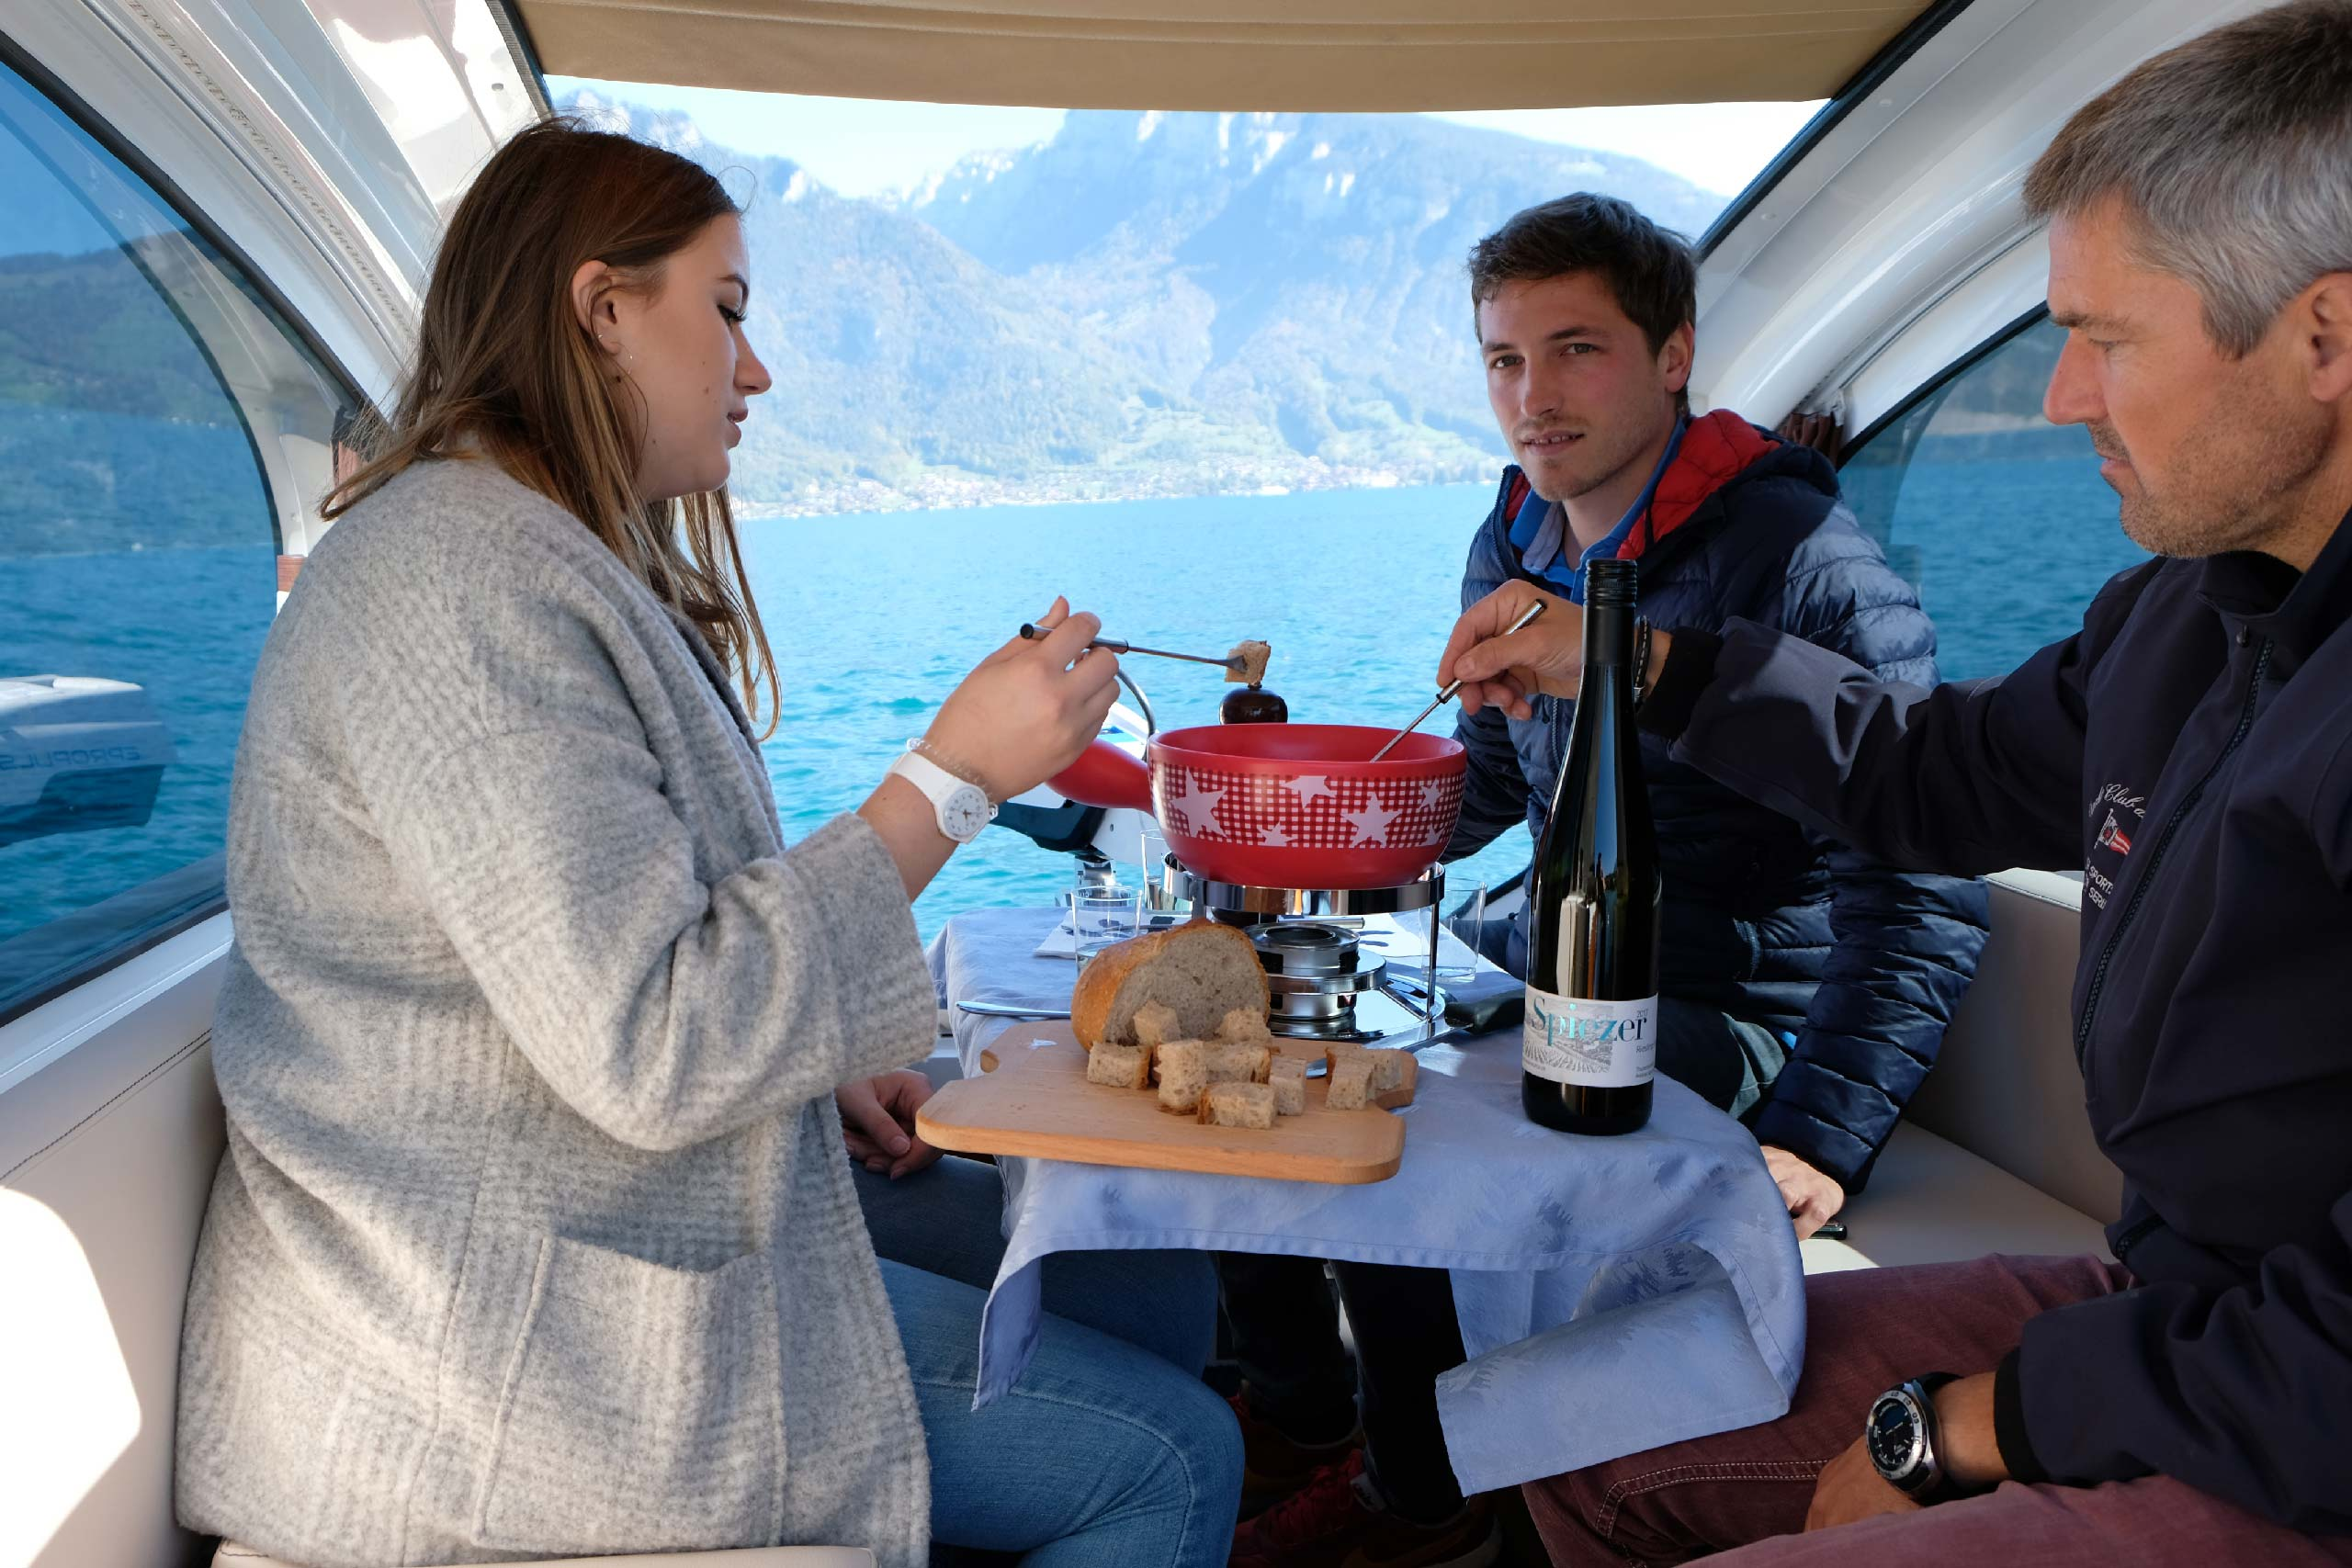 spiez-sealander-fondue-winter-thunersee.jpg